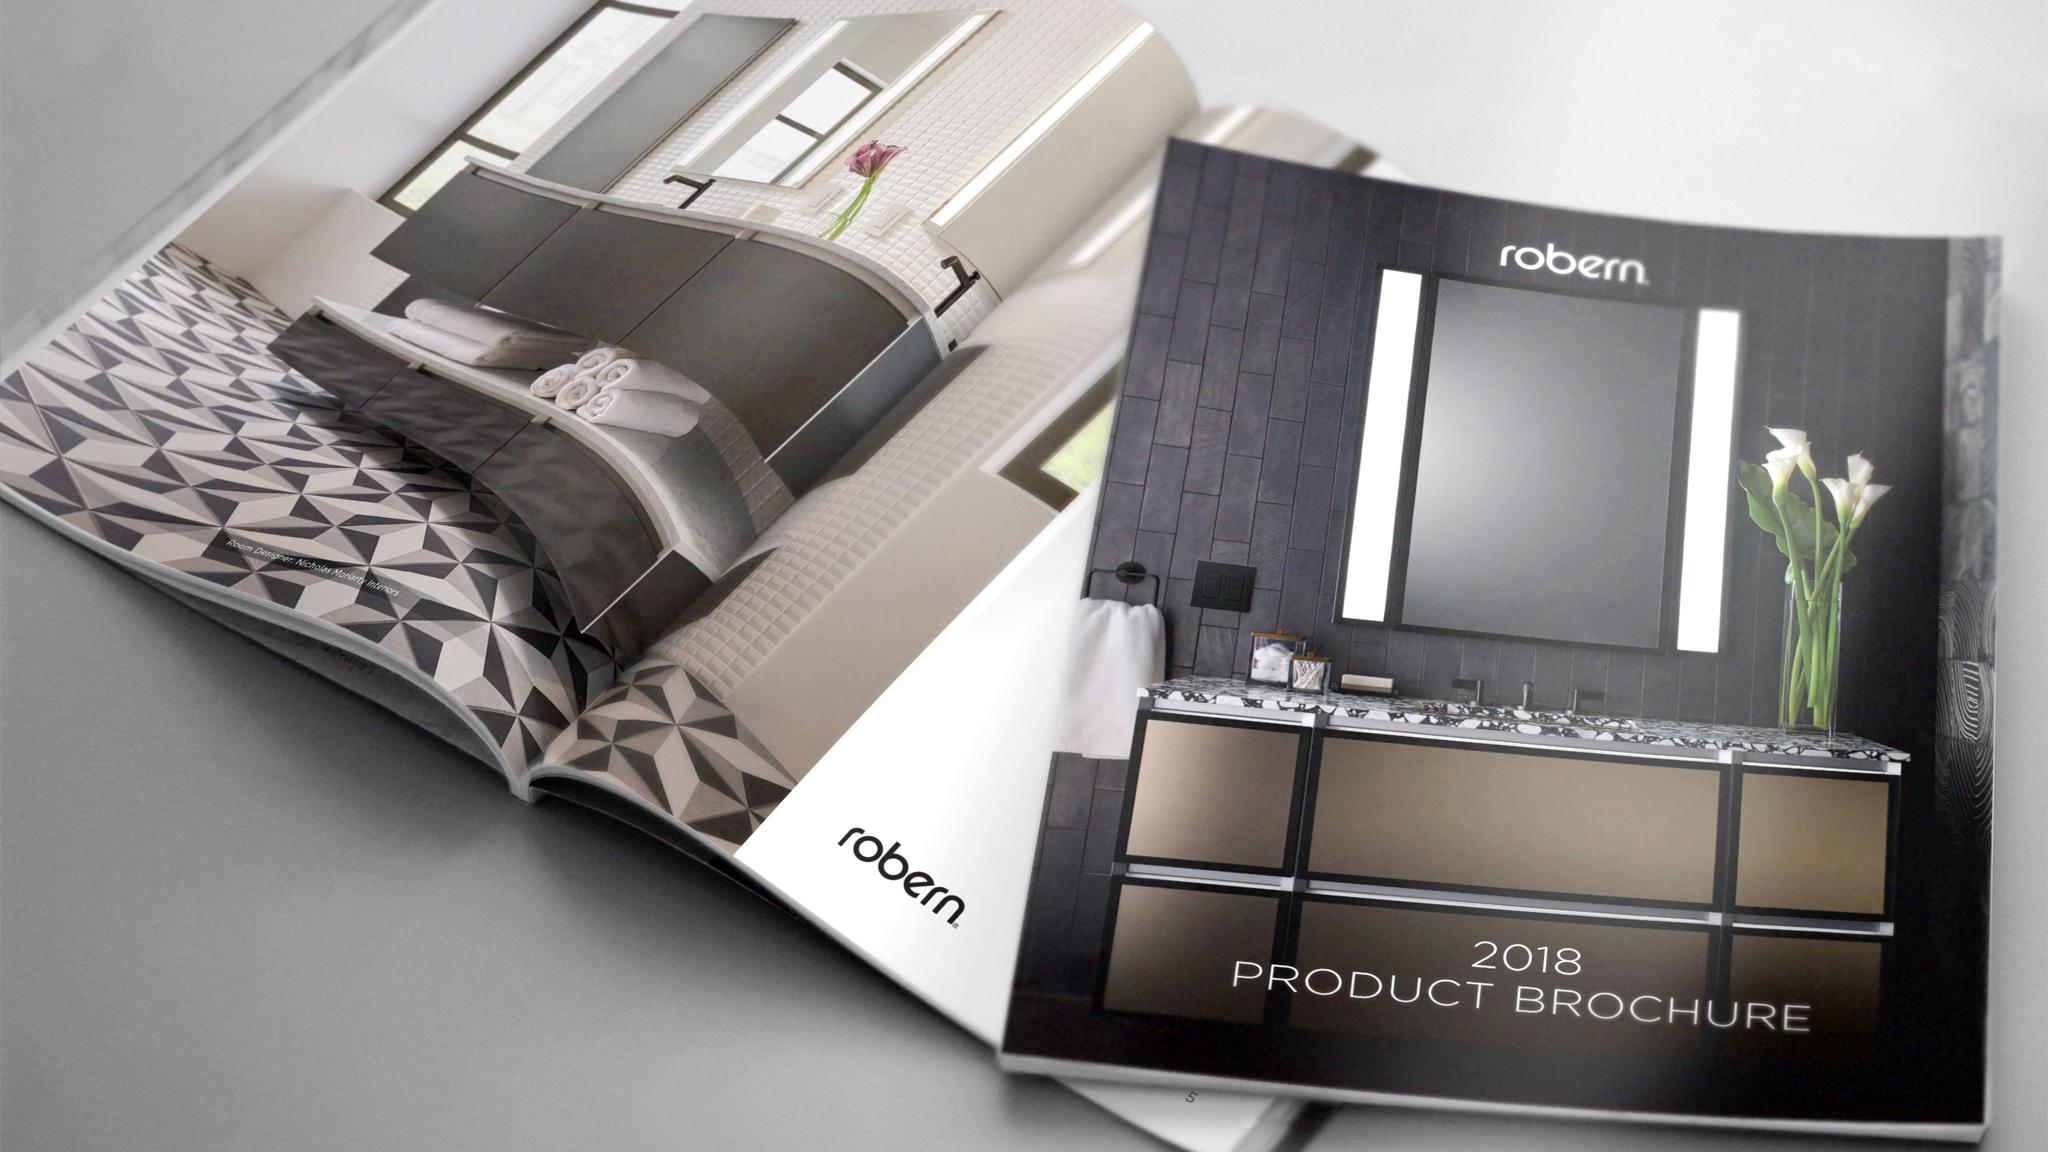 price books brochures robern